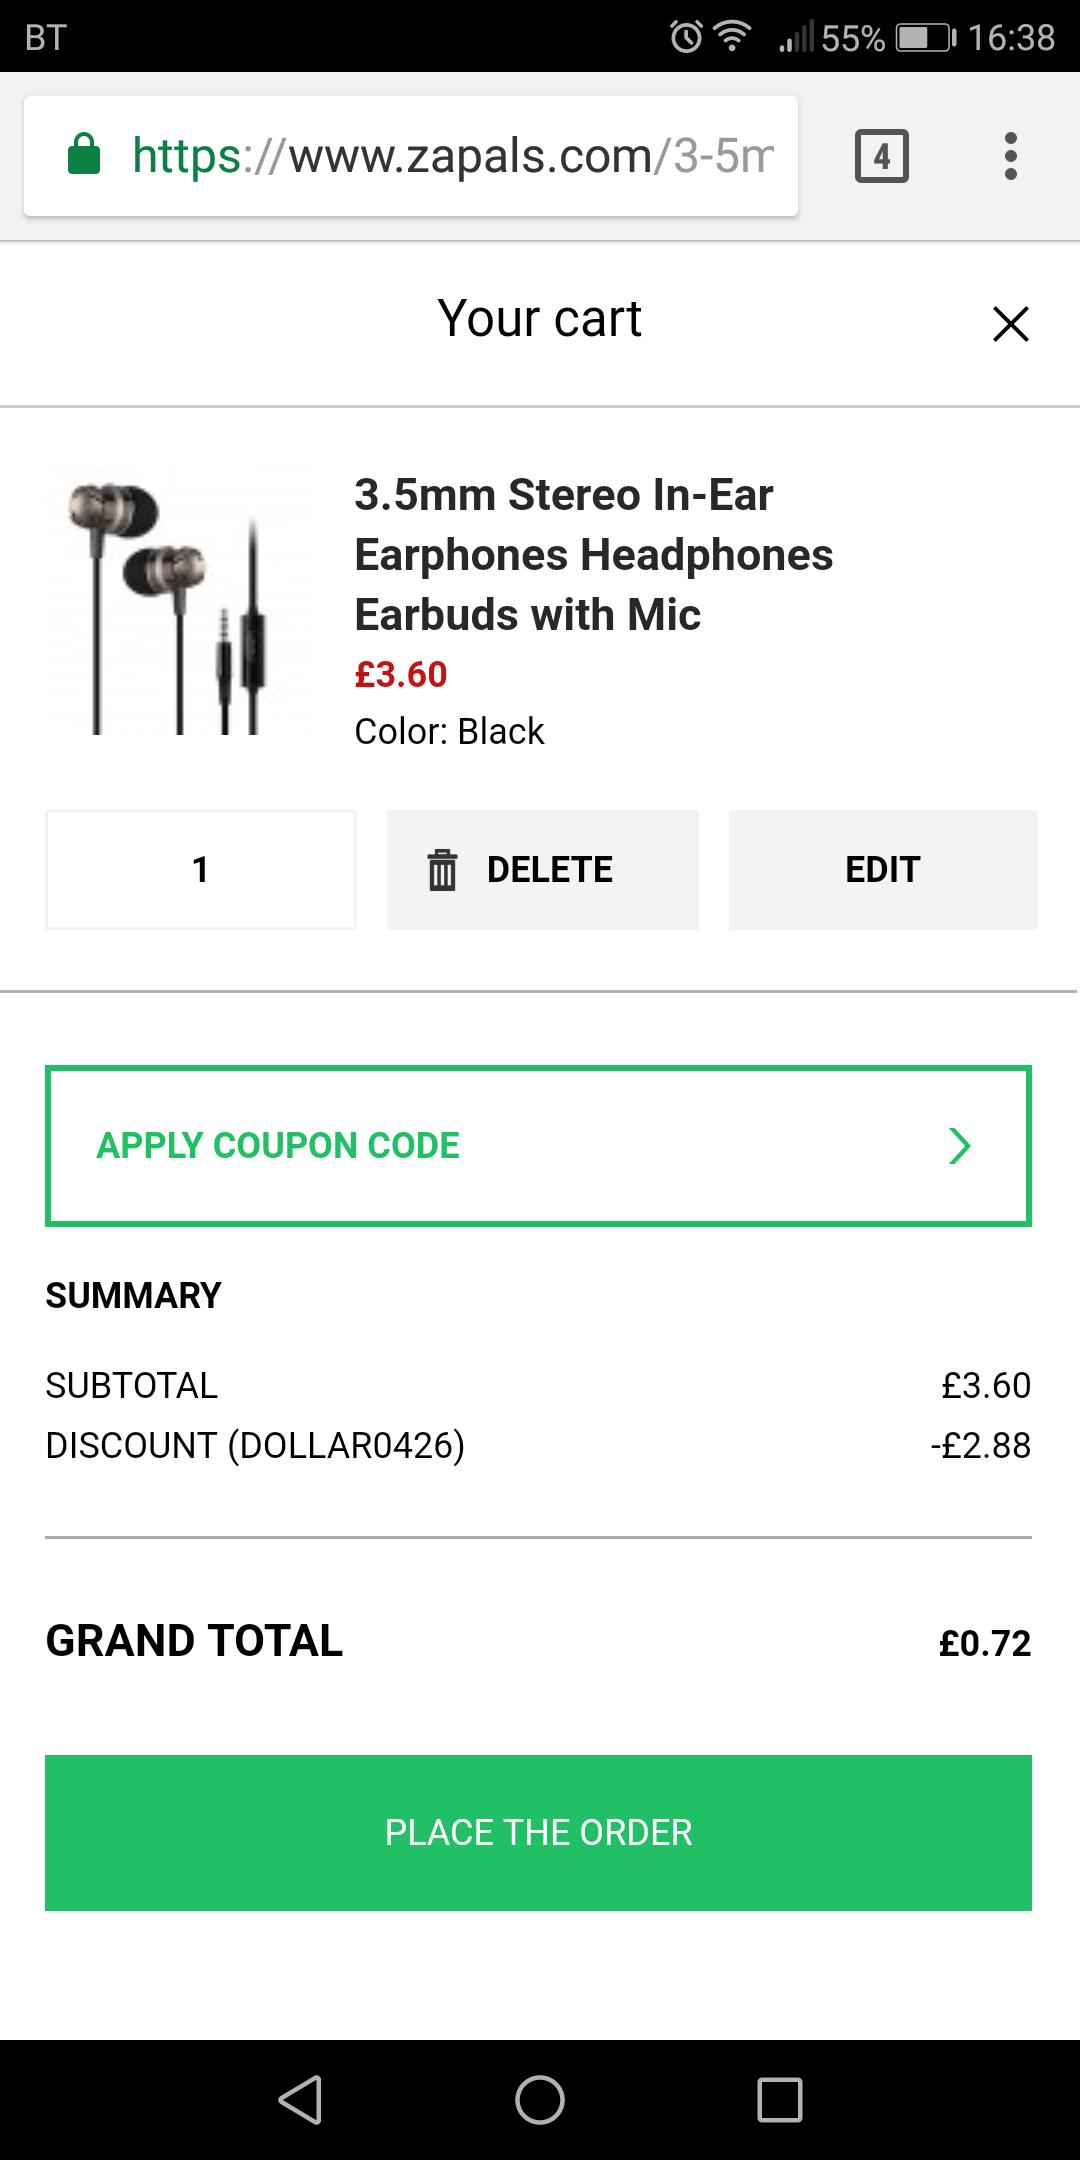 3.5mm Stereo In-Ear Earphones Headphones Earbuds with Mic 72p @ Zapals